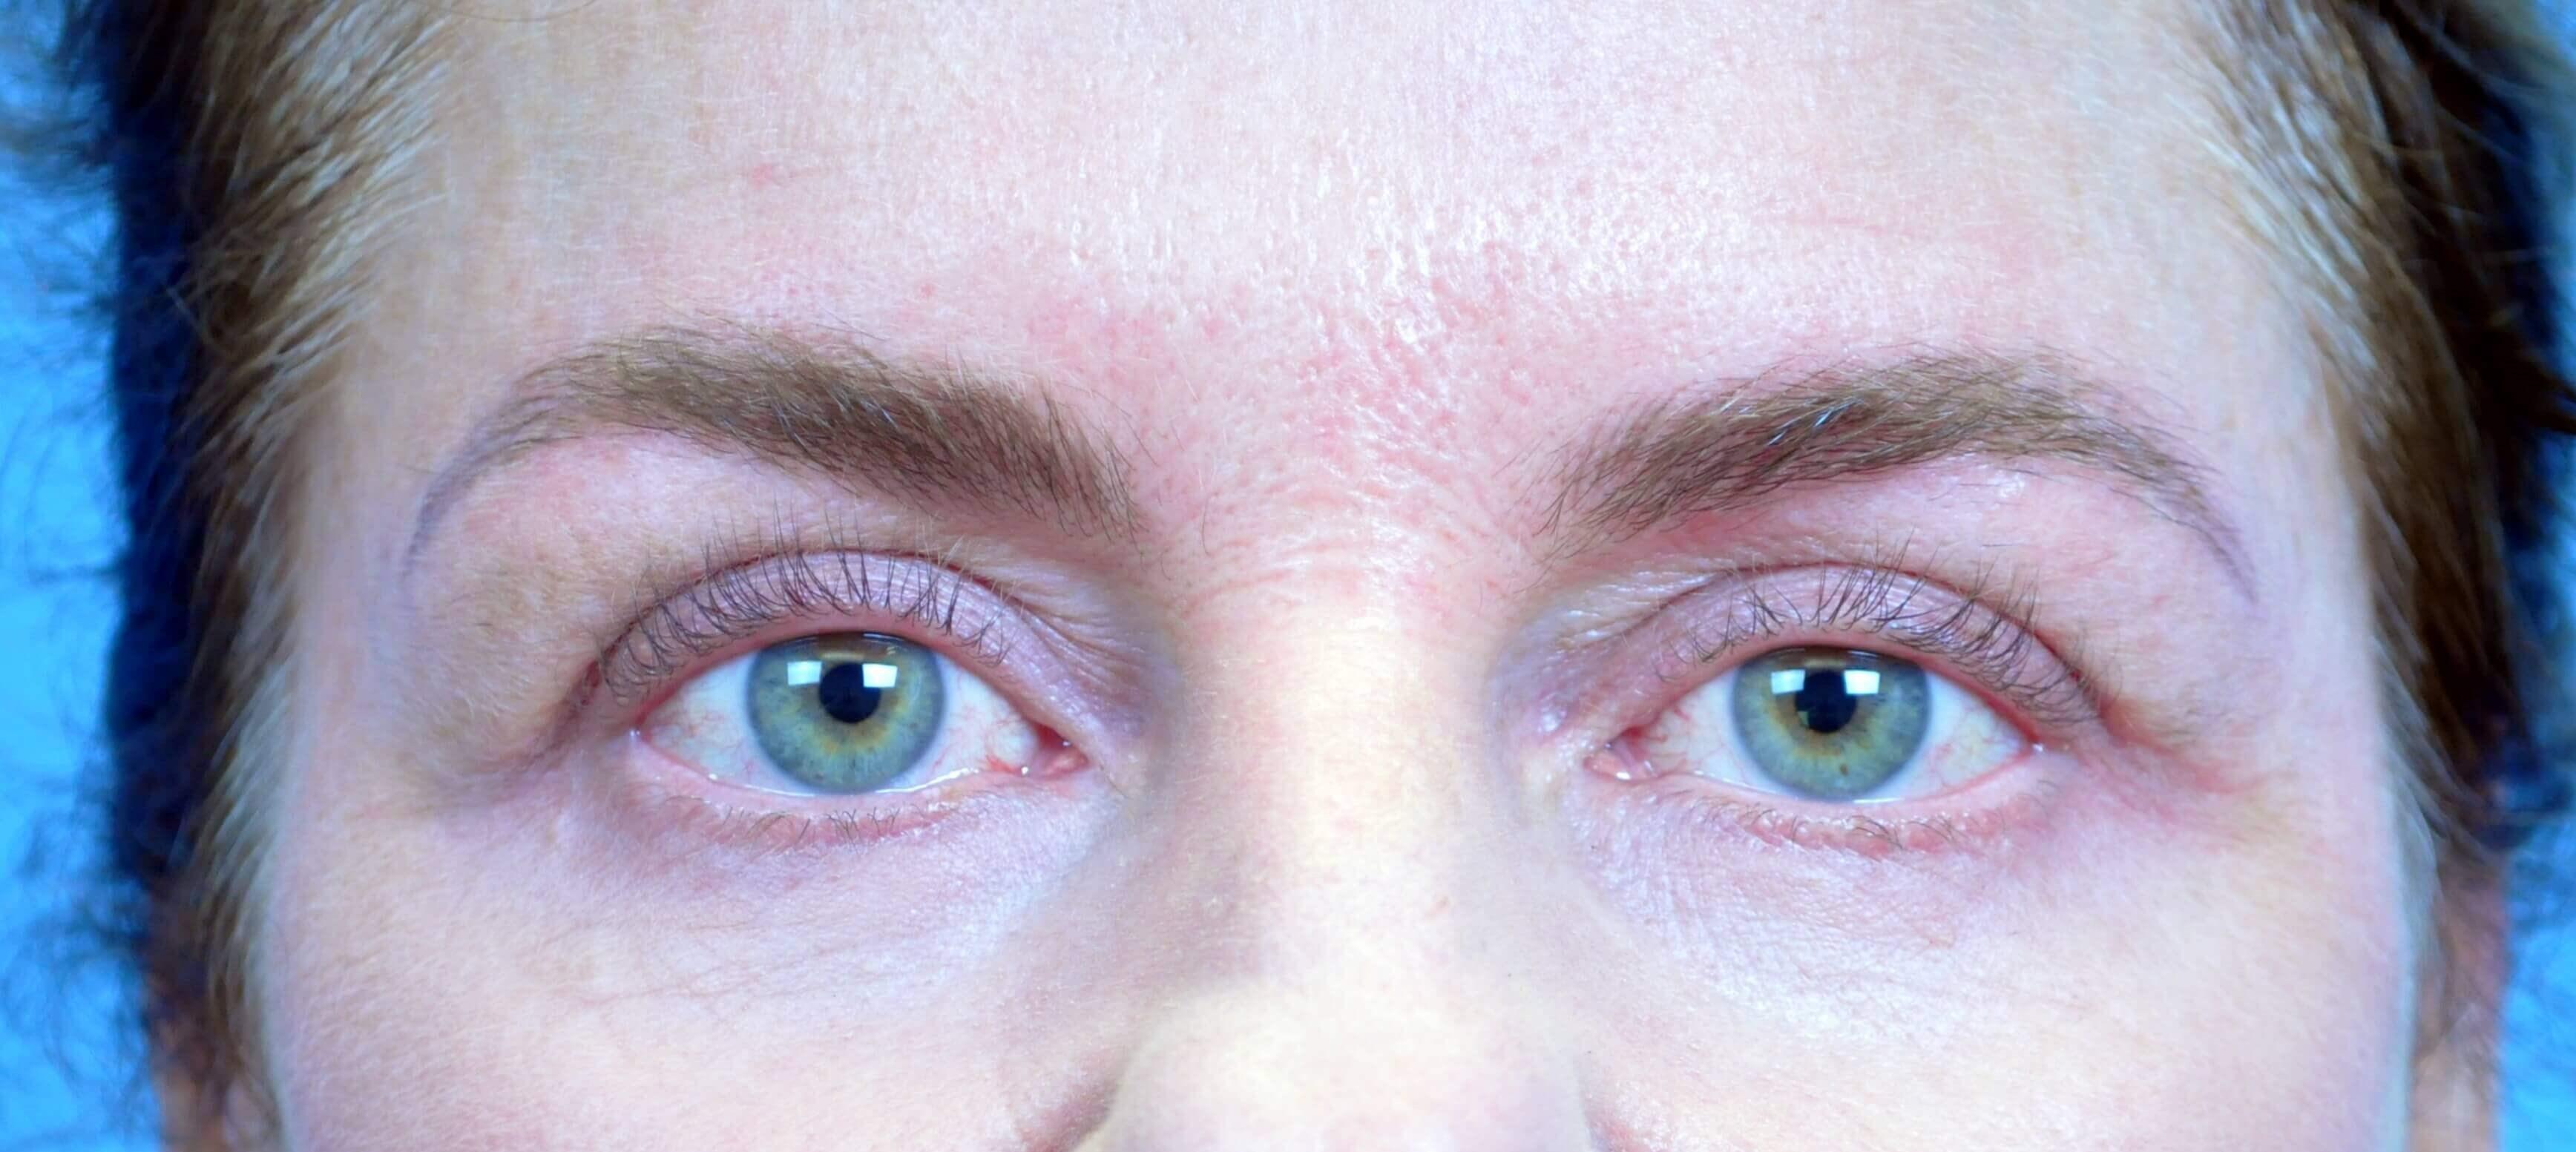 Atlanta Ga Patient Has Cosmetic Tattoo Of Eyebrows